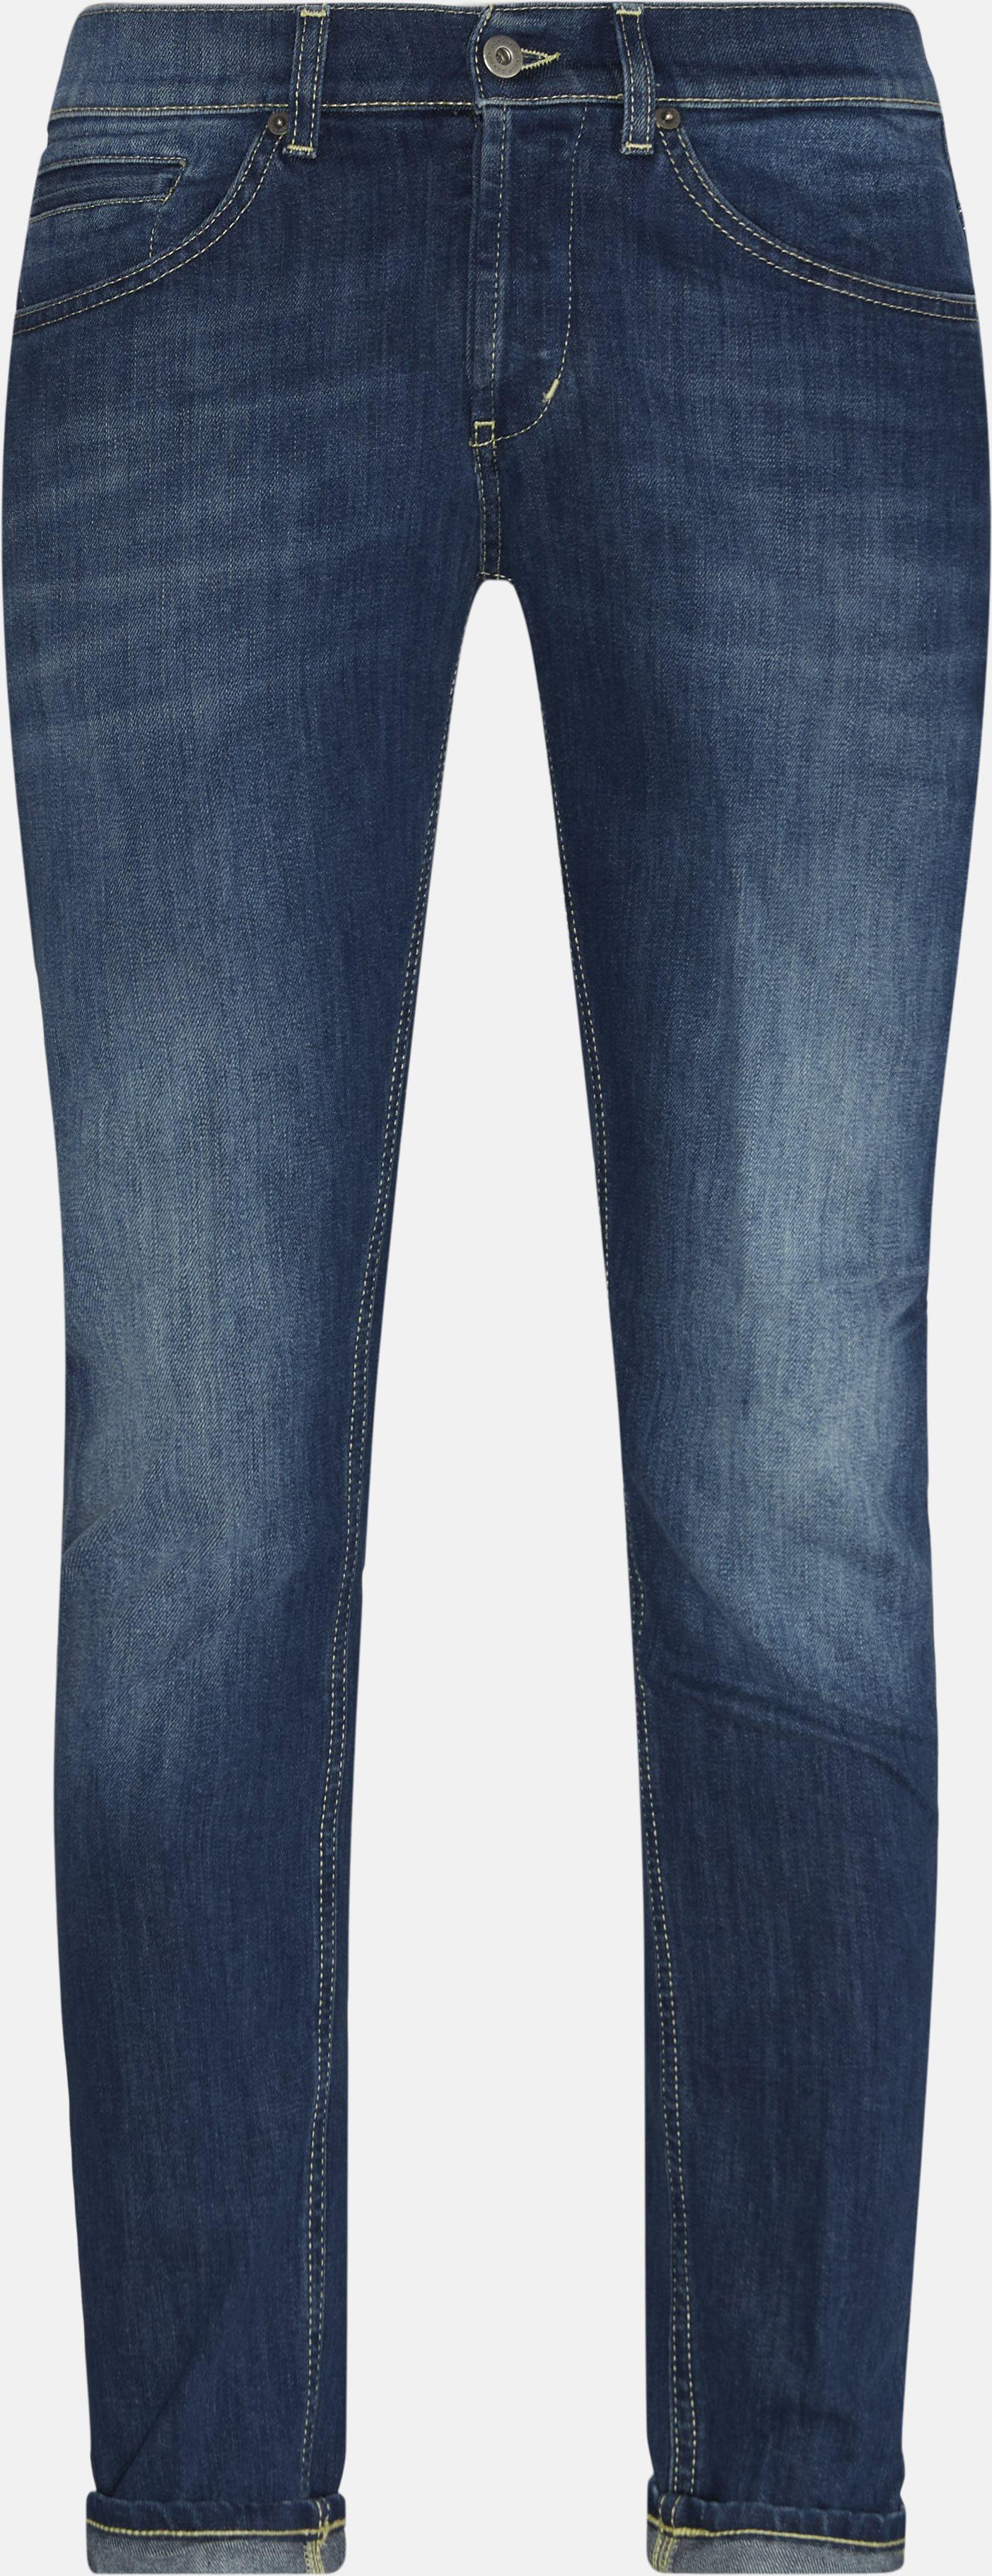 George Jeans - Jeans - Slim fit - Denim